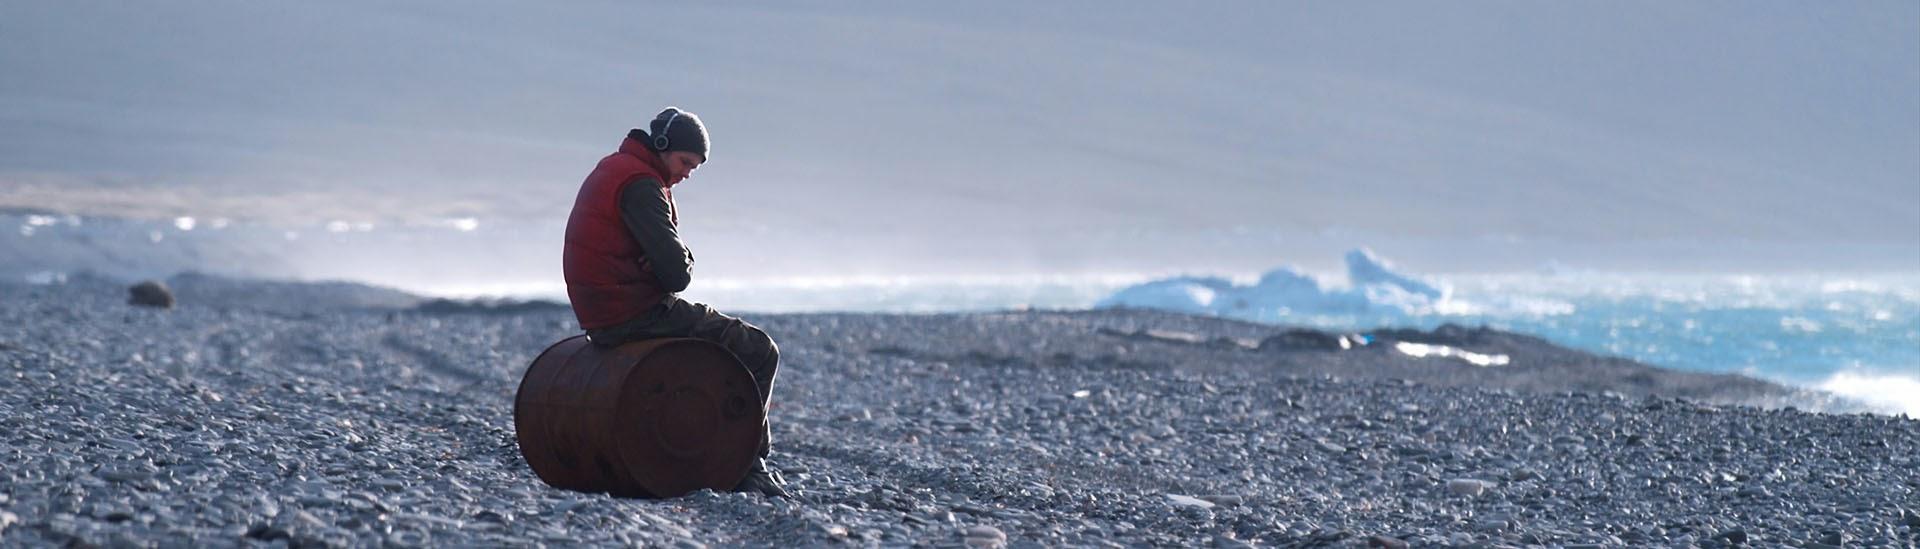 Baner filmu 'Jak Spędziłem Koniec Lata'